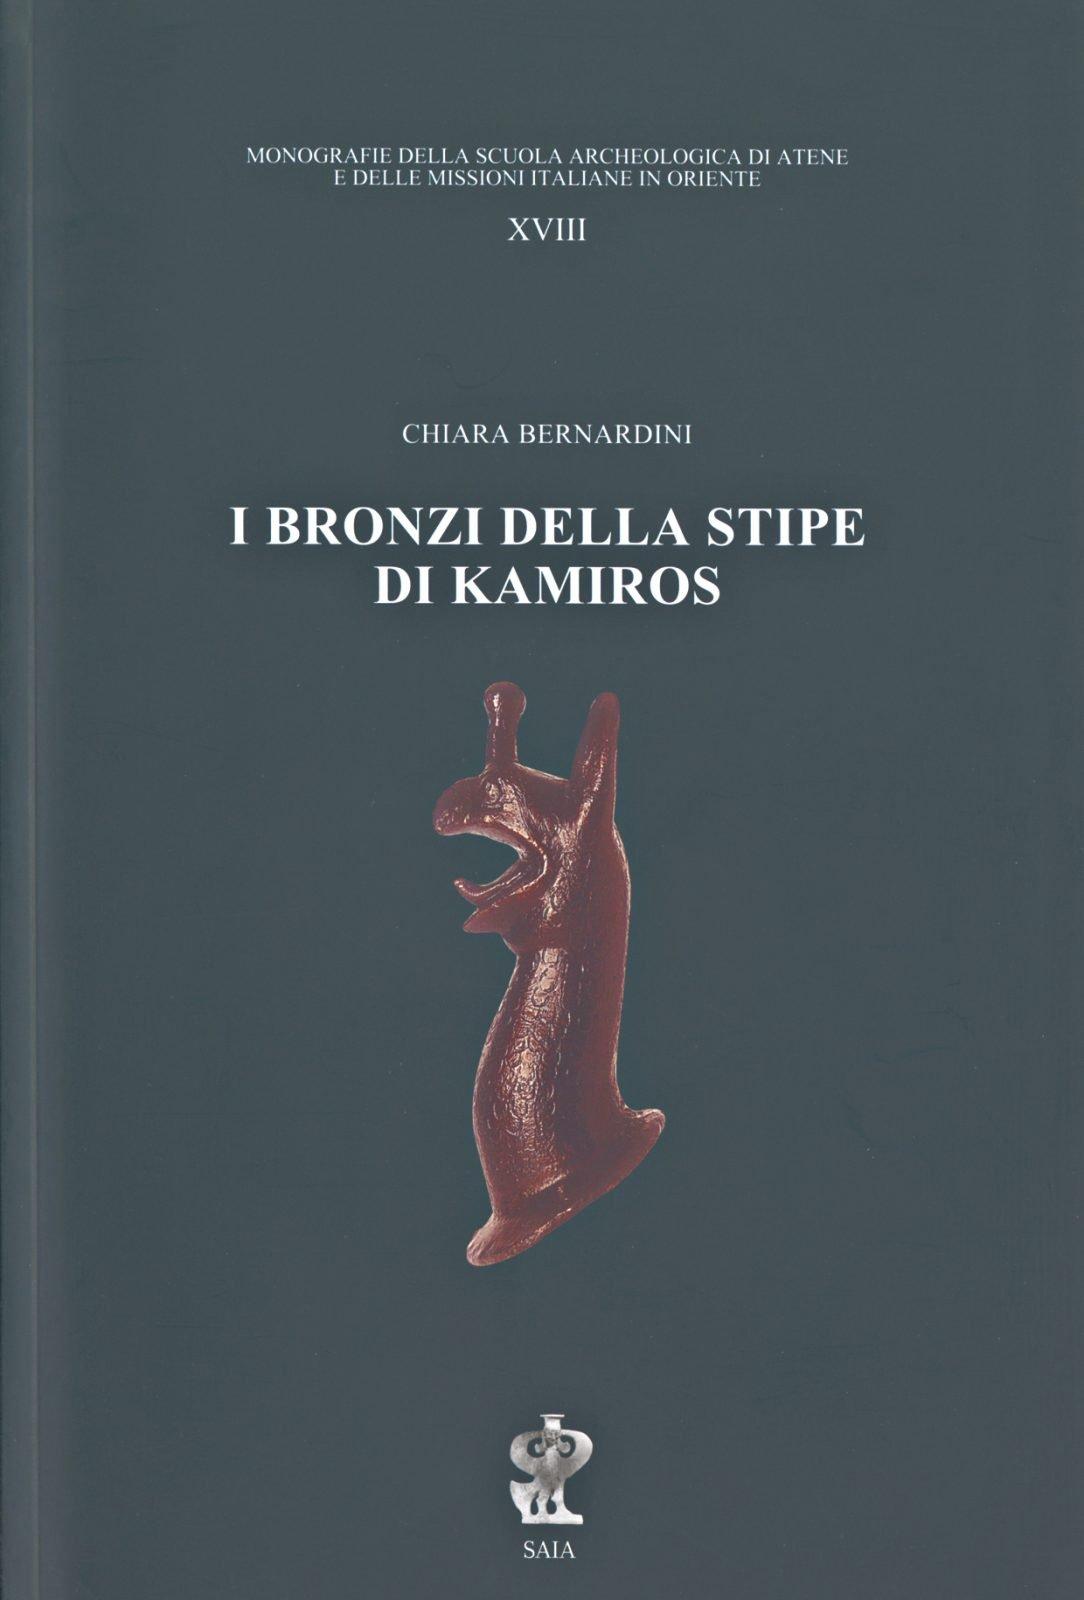 I bronzi della stipe di Kamiros, copertina.